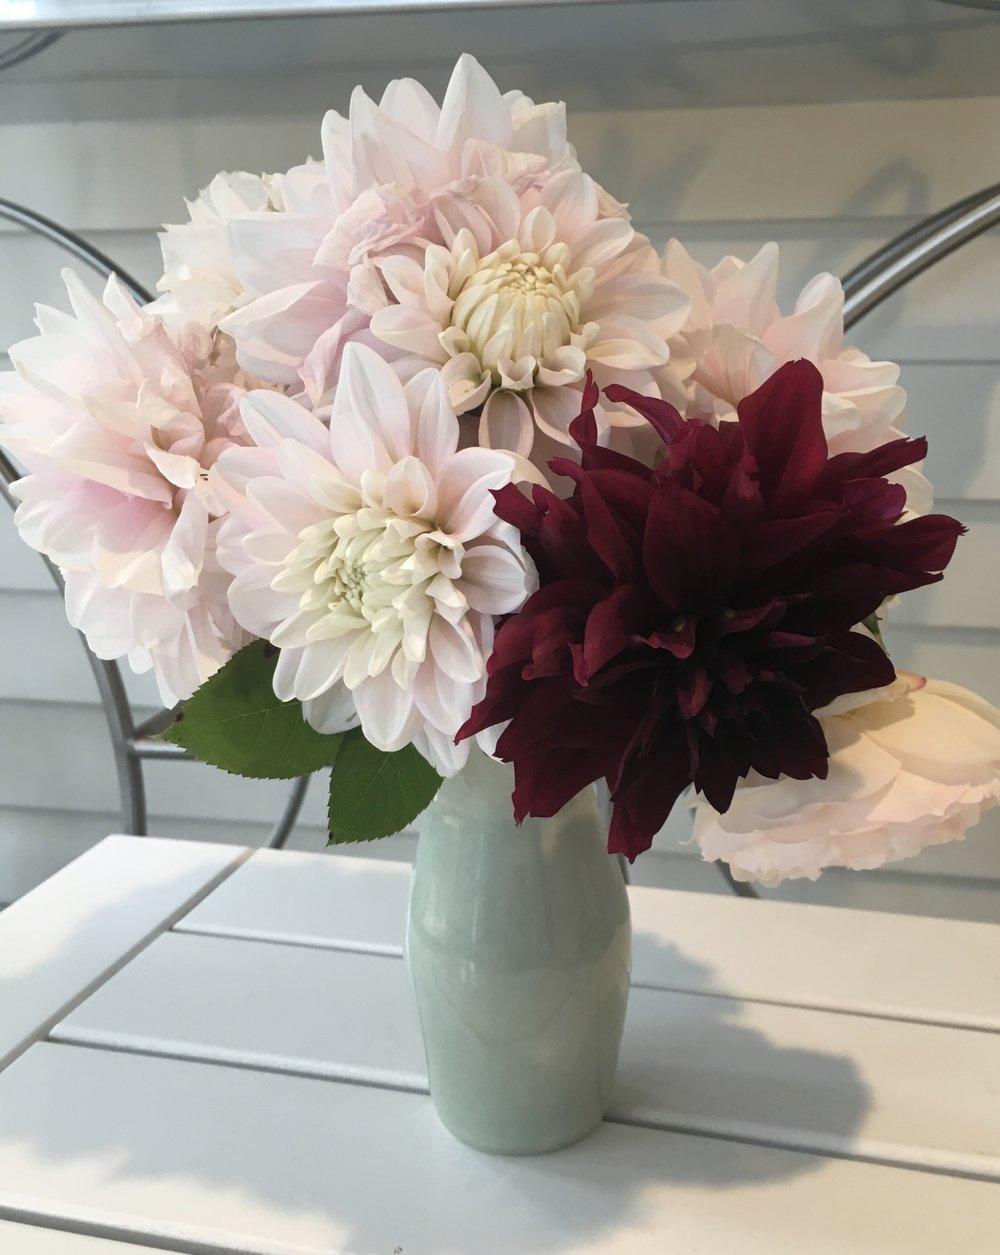 Cut Flowers from the Garretts' Healthy Yard